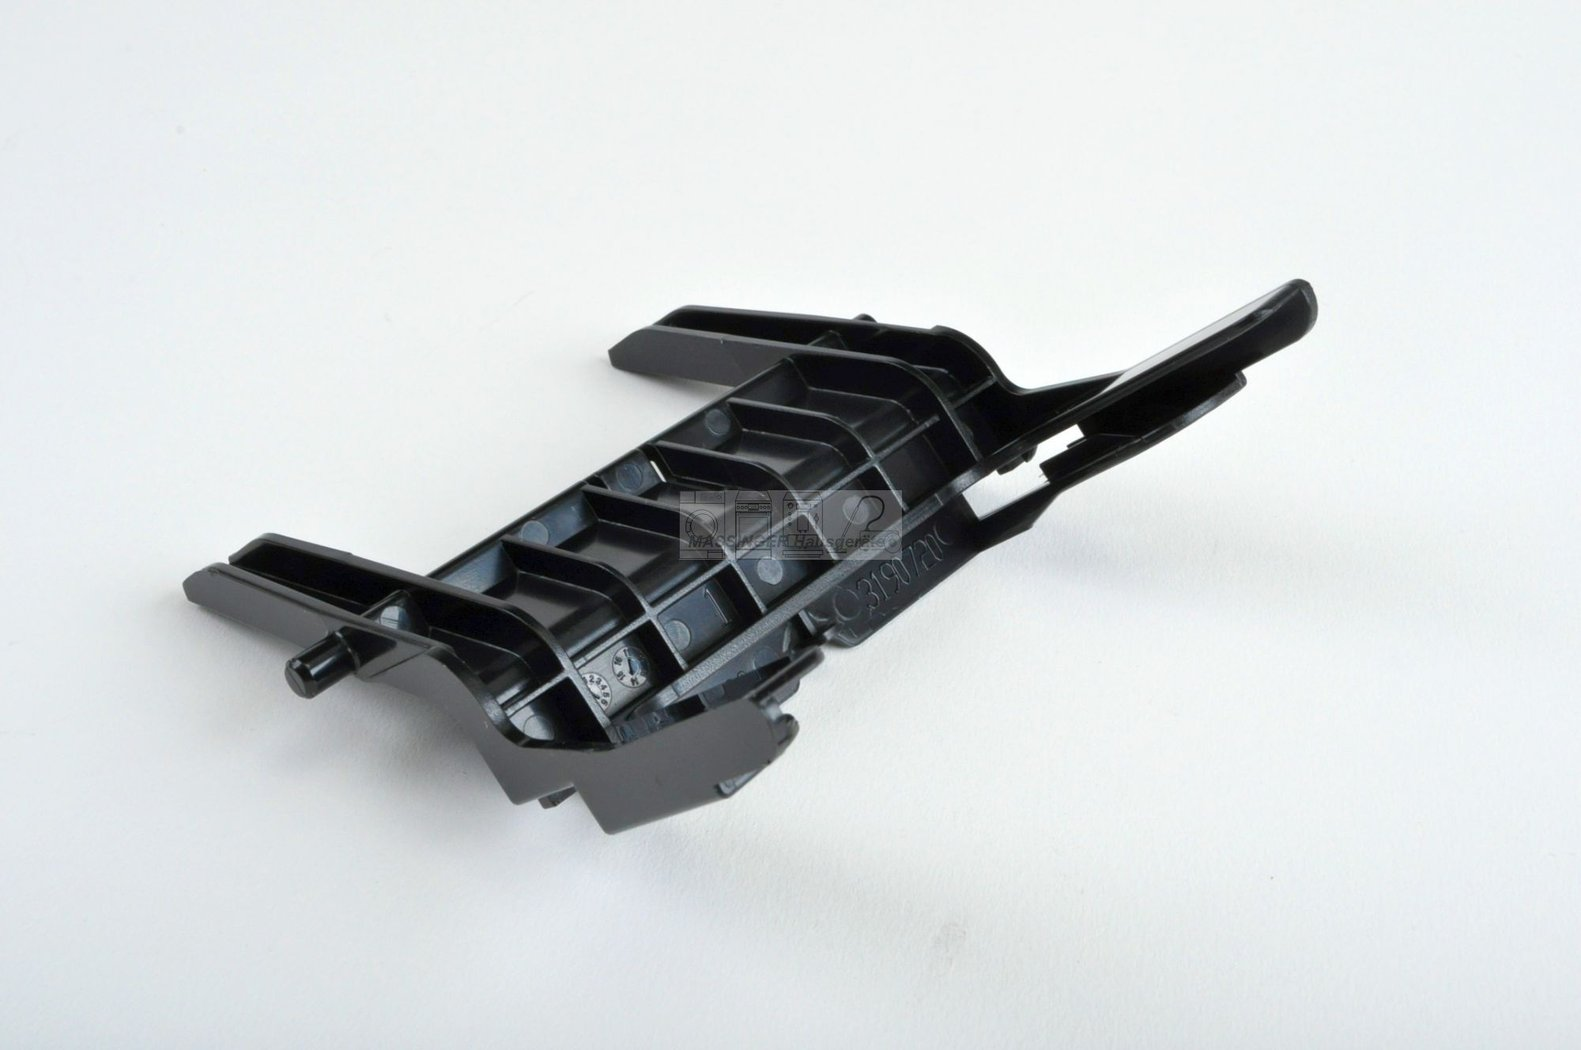 10 Staubsaugerbeutel für Bosch BGL35MOVE2 BGL35MOVE3 Staubbeutel BGL35MOVE